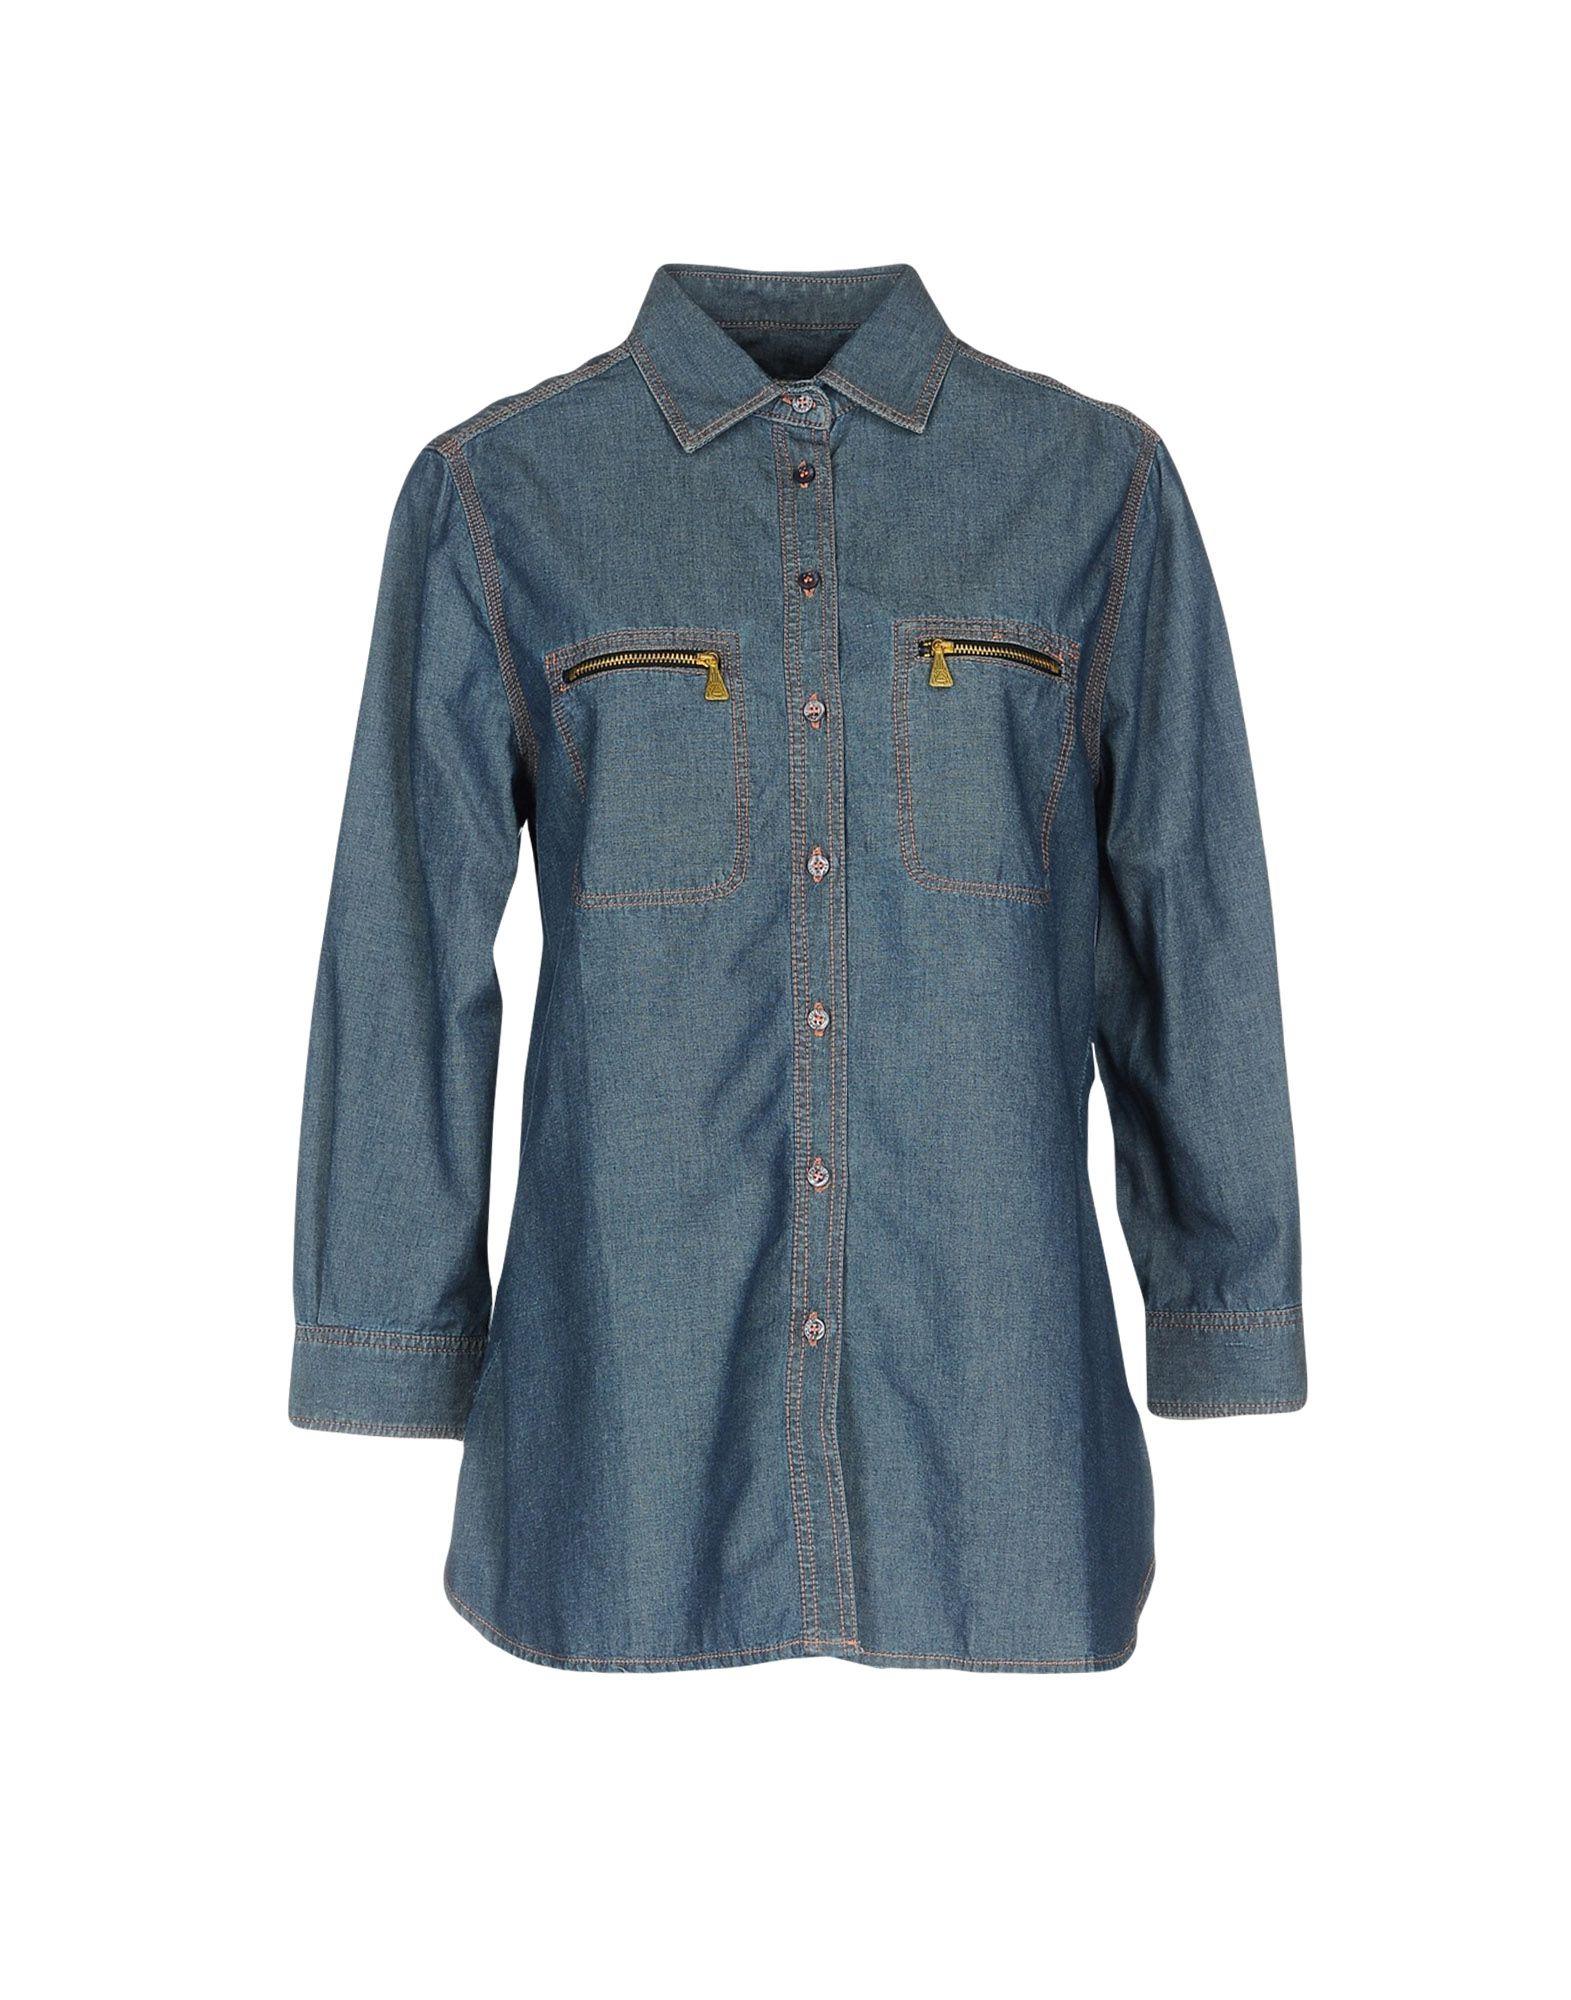 ROŸ ROGER'S Джинсовая рубашка джинсовая рубашка quelle arizona 610860